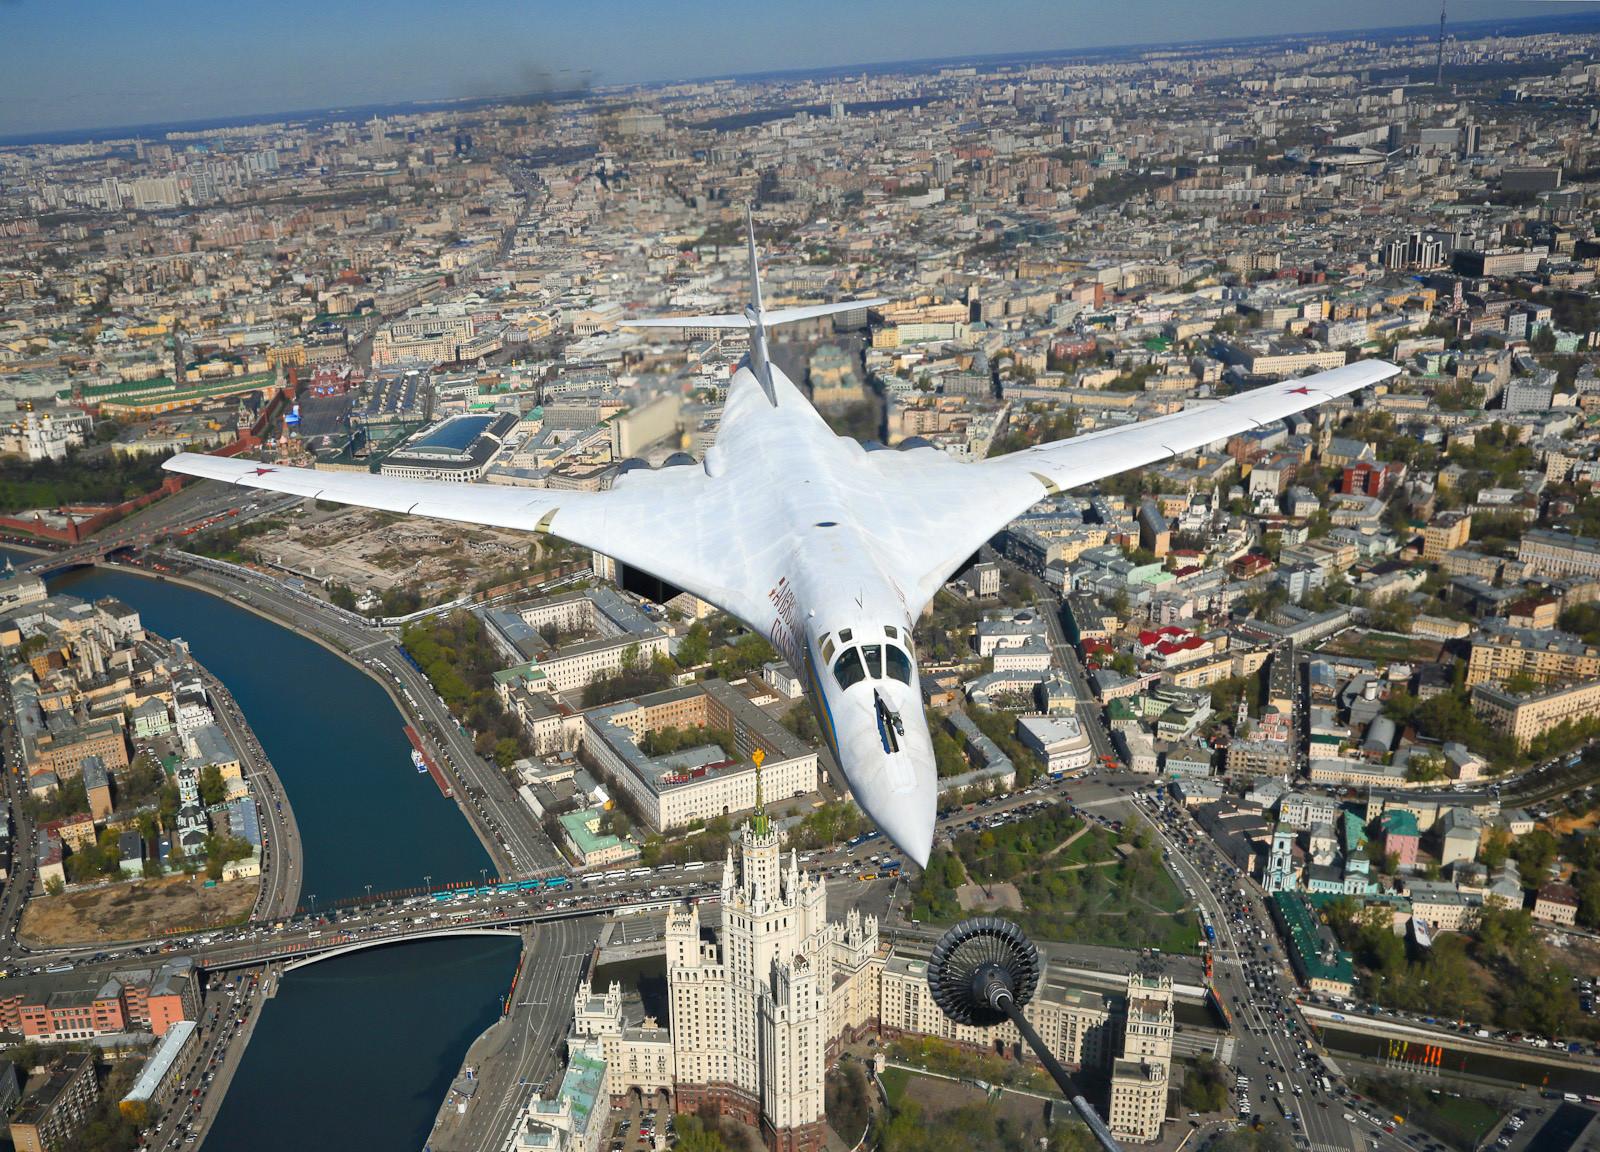 Стратегическият бомбардировач Туполев Ту-160 в небето над Москва.